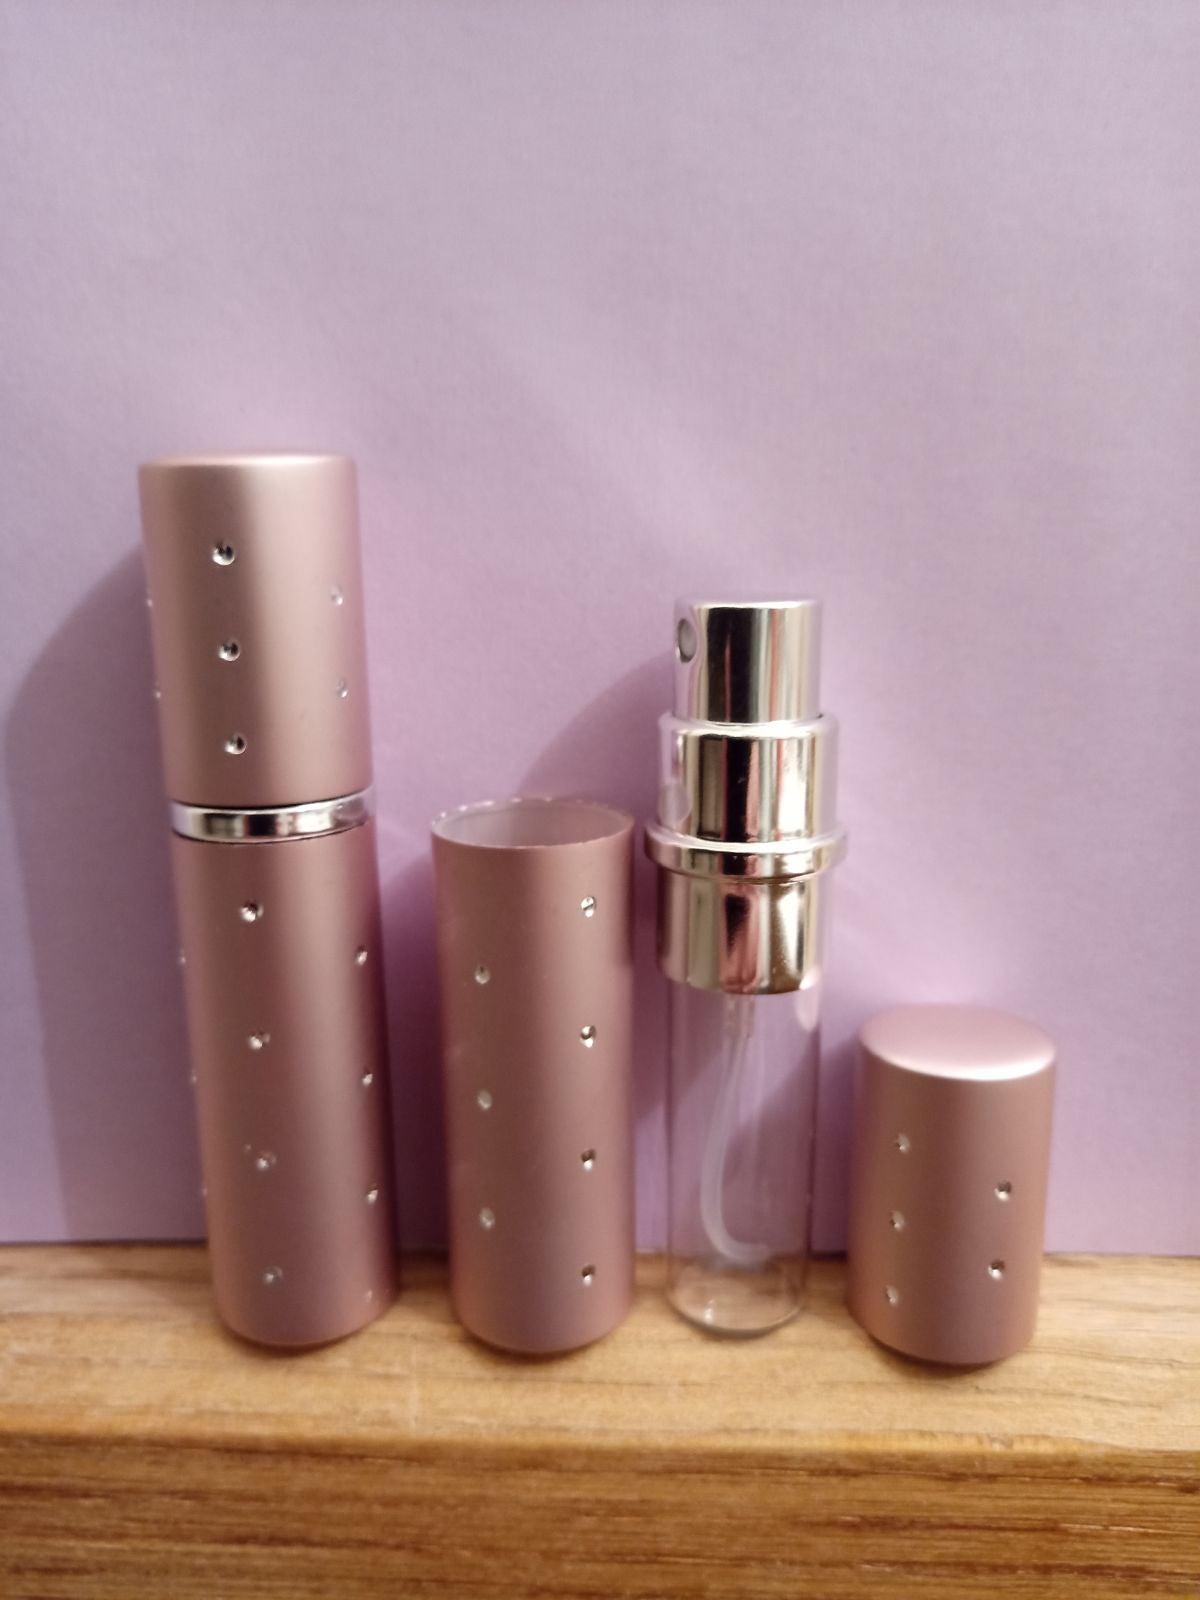 2 Perfume/Disinfectant Atomizers EMPTY